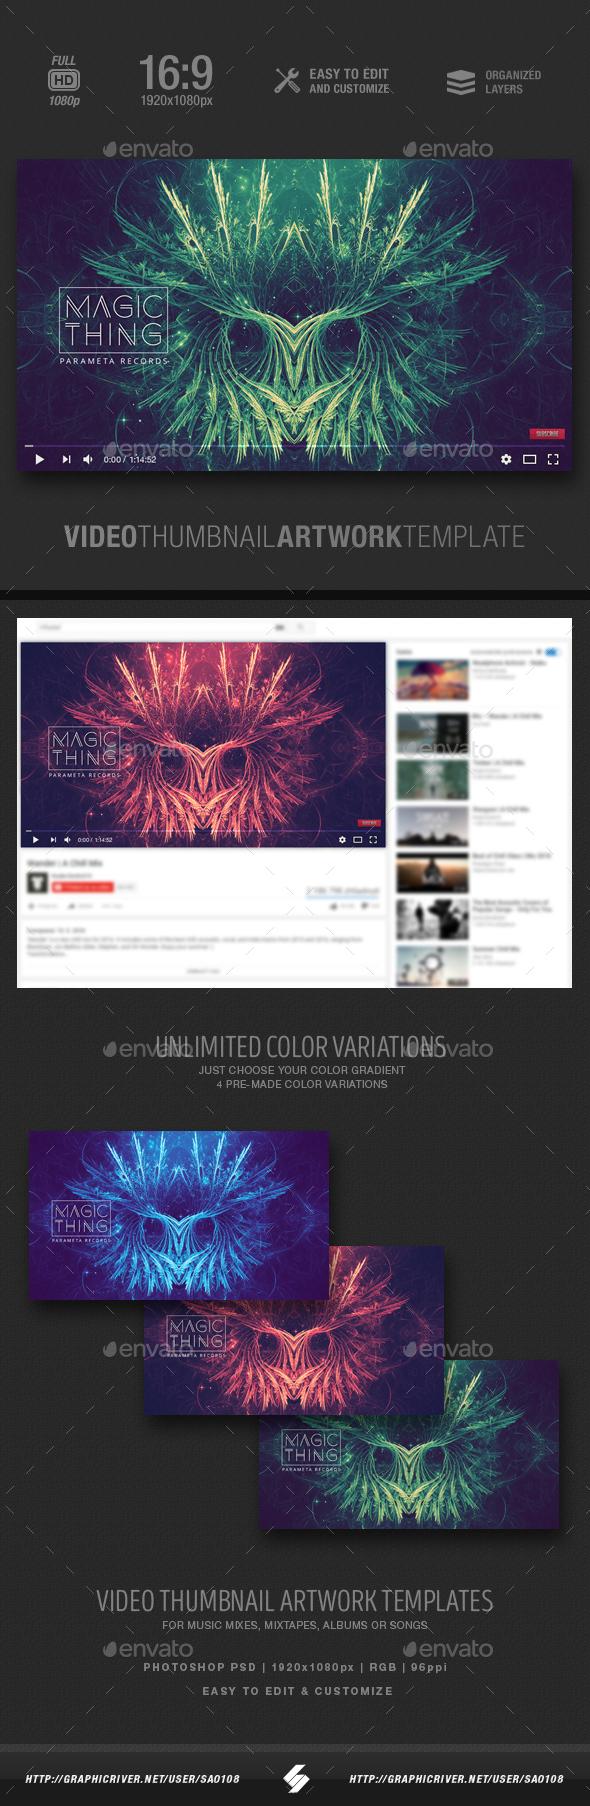 Magic Thing - Music Video Thumbnail Artwork Template - YouTube Social Media